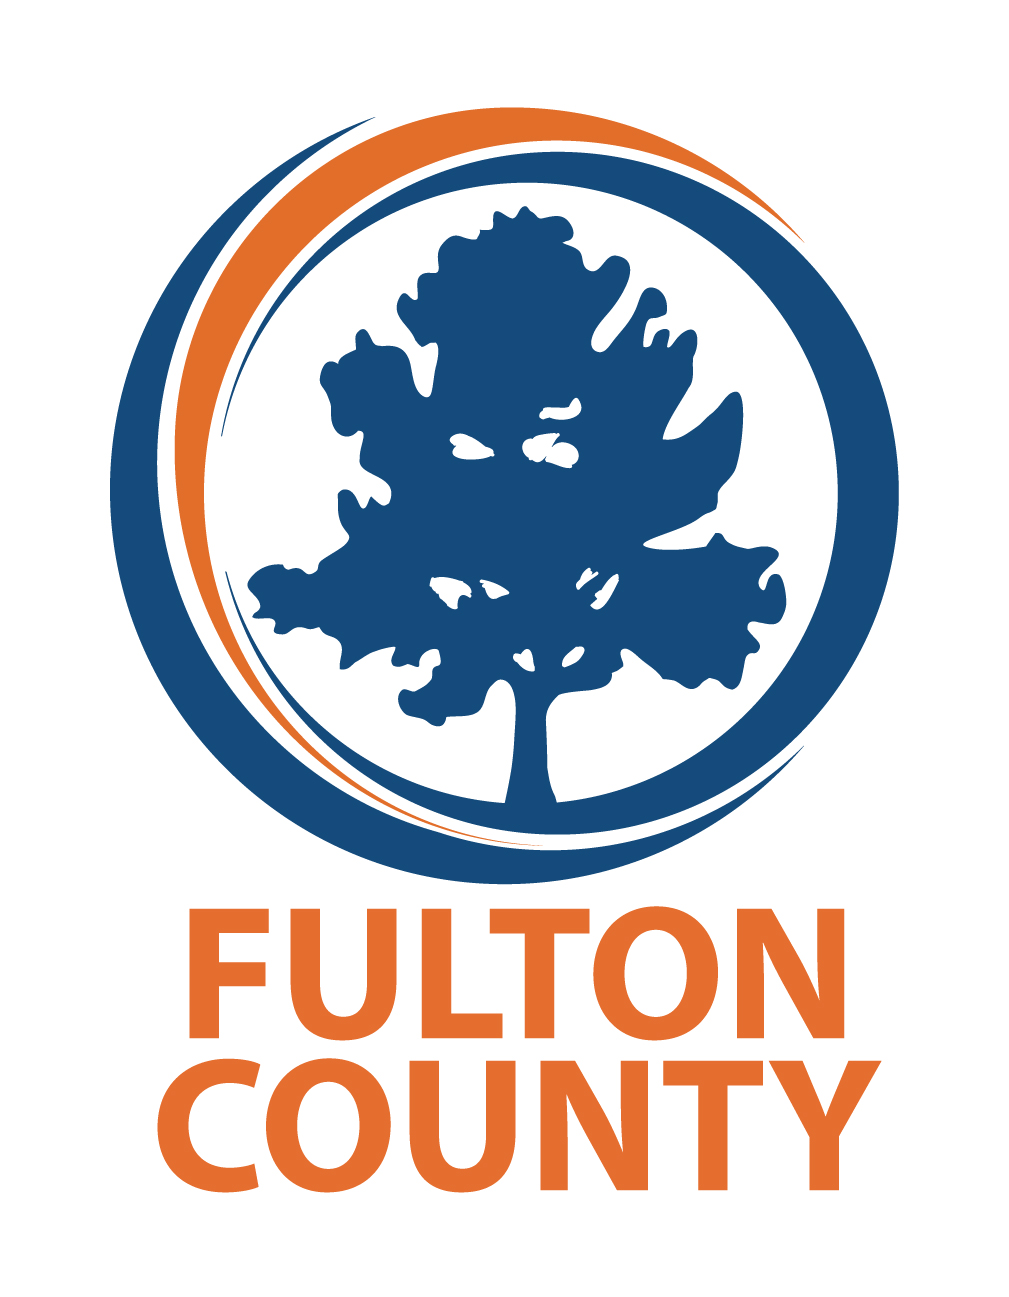 fulton county logo-color